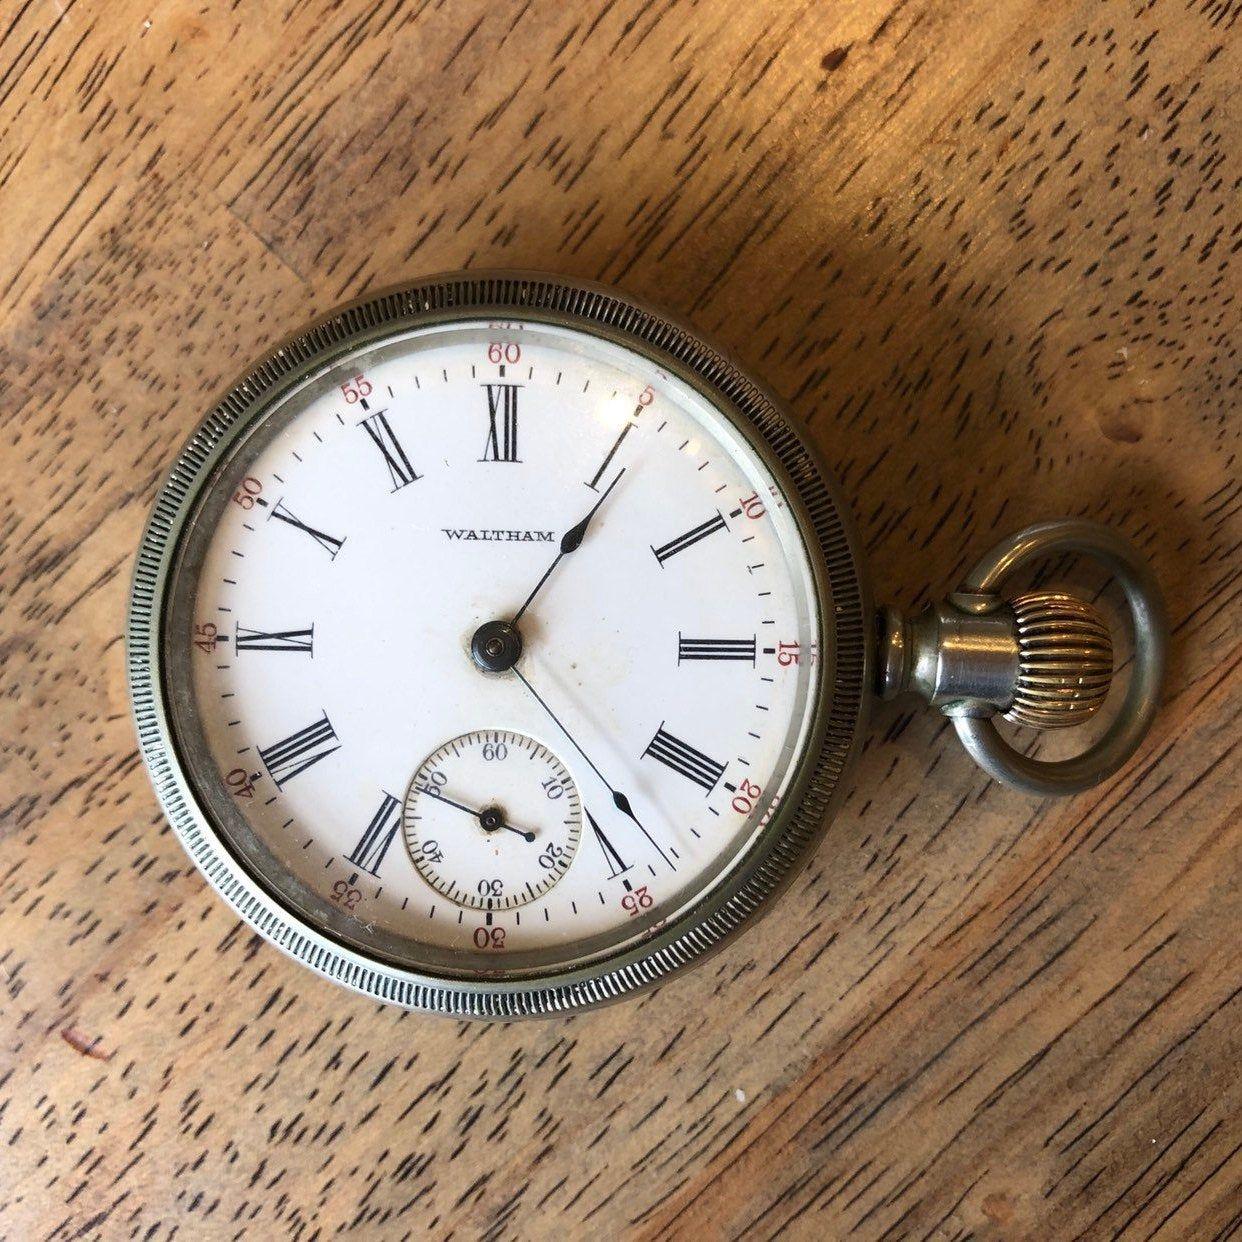 Vintage American Waltham pocket watch. Runs. Movement